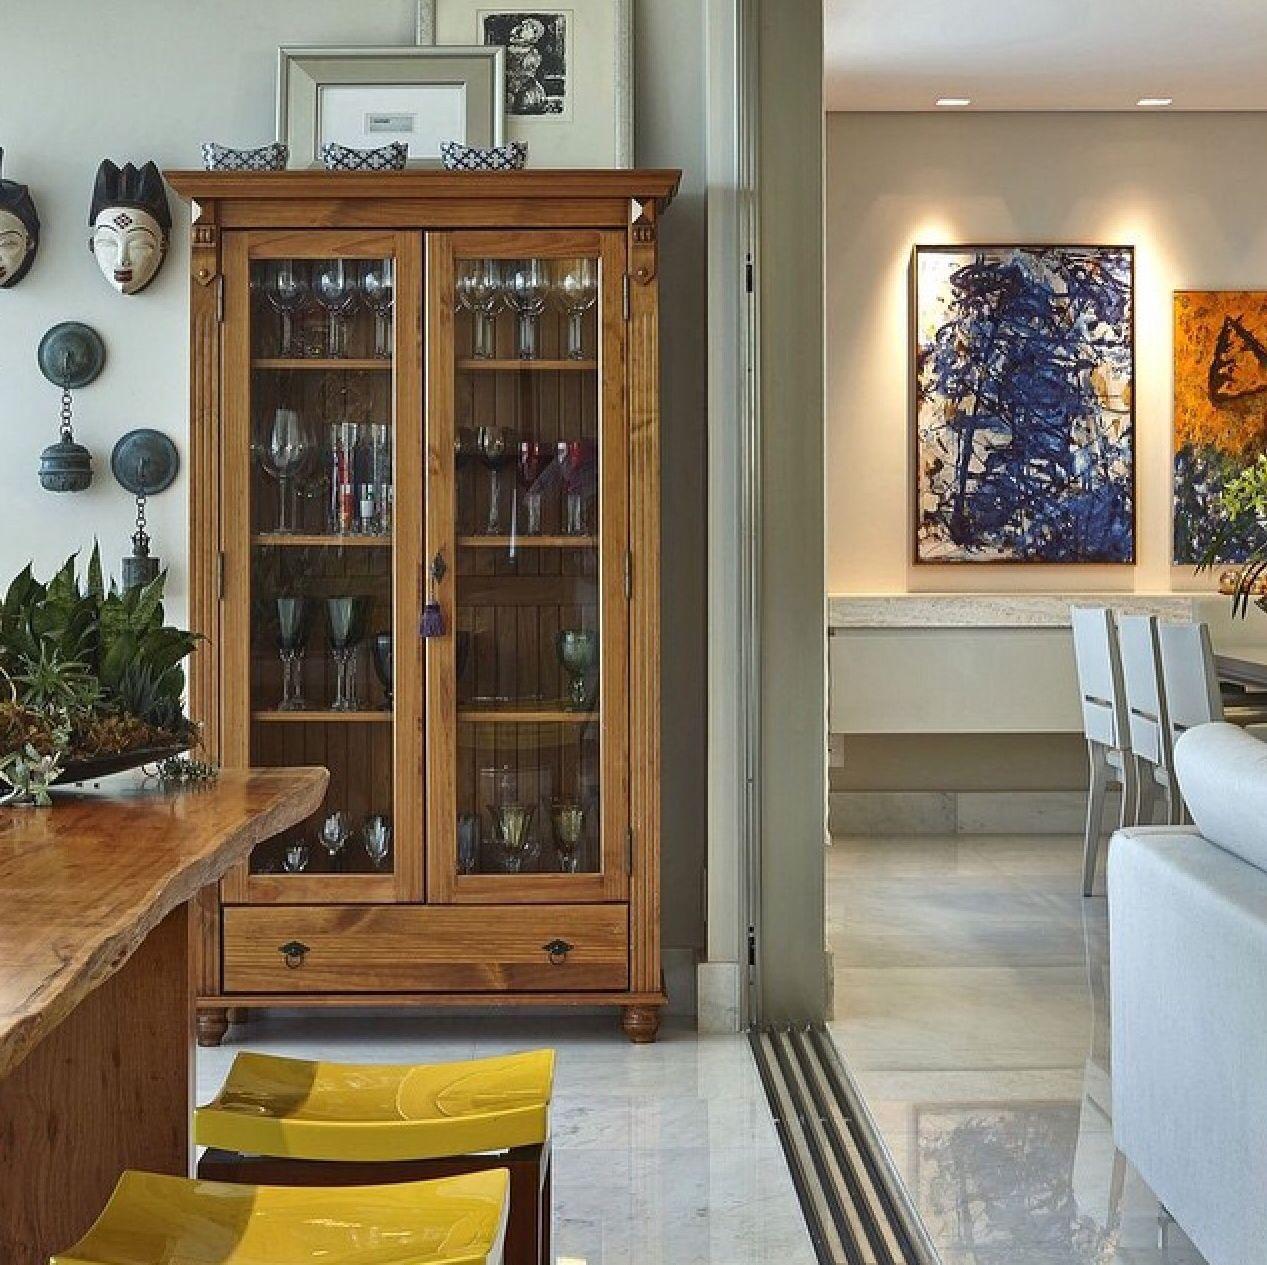 Vitrina vajillera cocina | Muebles viejos | Pinterest | Vitrinas ...